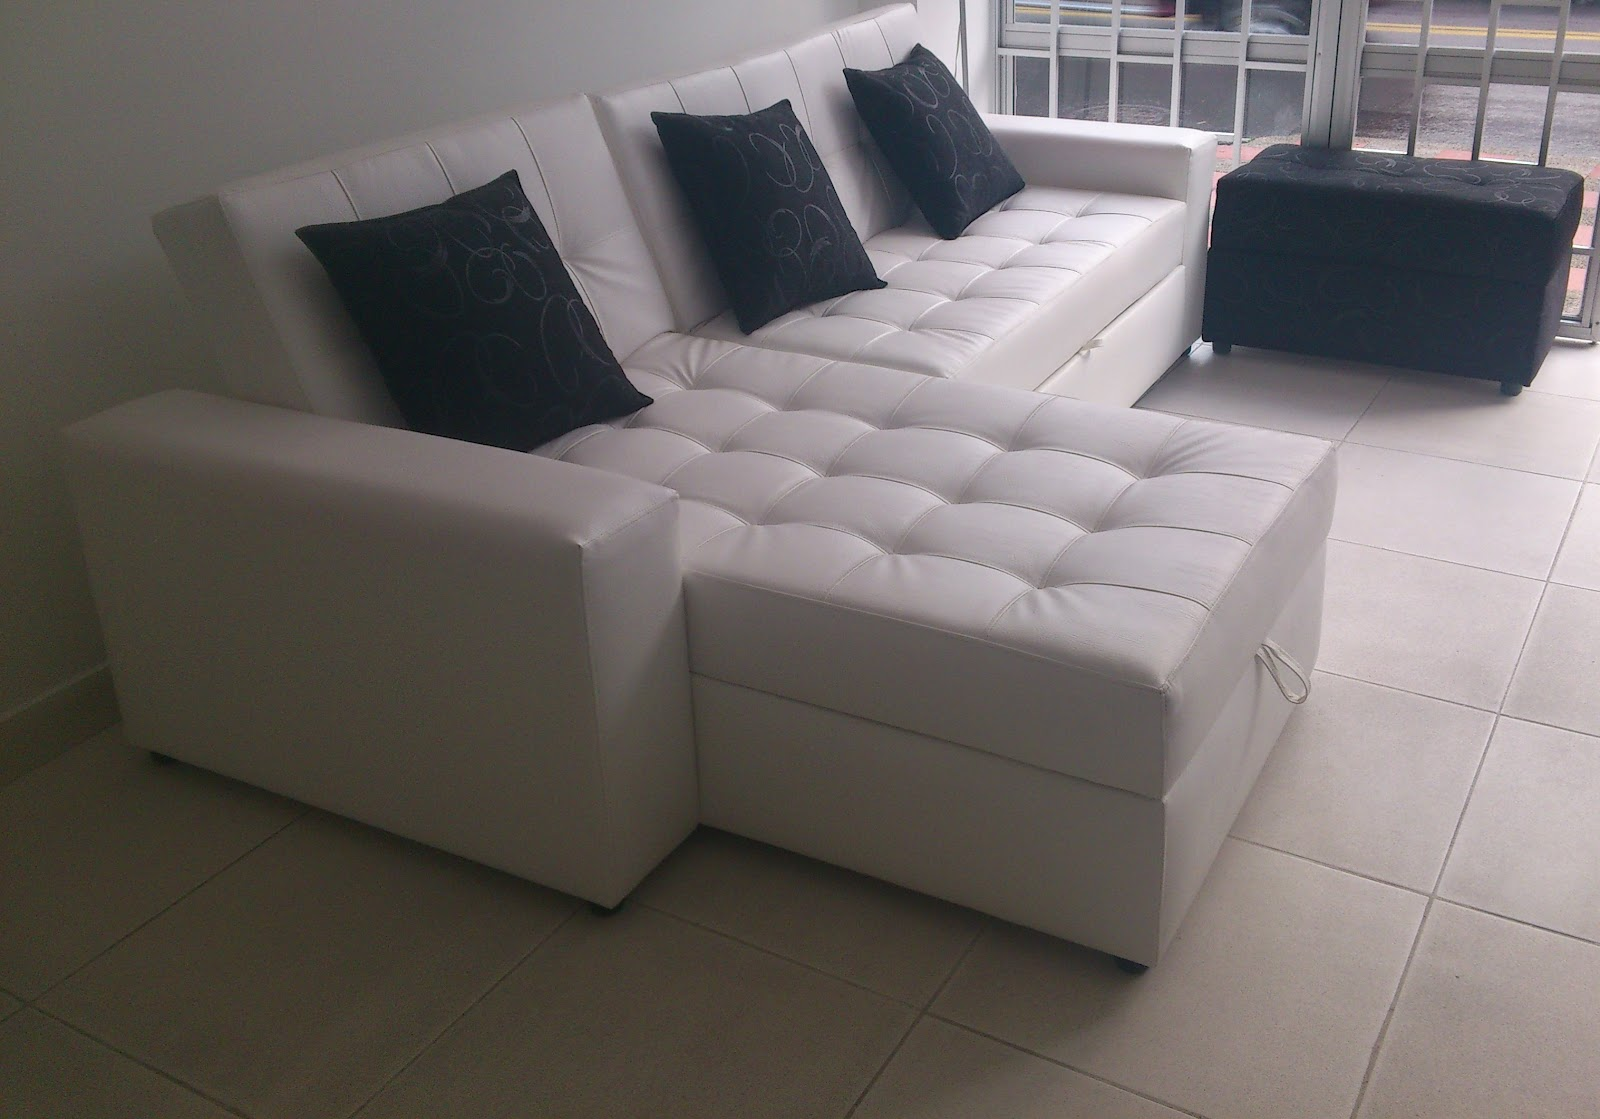 sofa cama bogota colombia thick mattress bed uk muebles alkar mueblesalkar